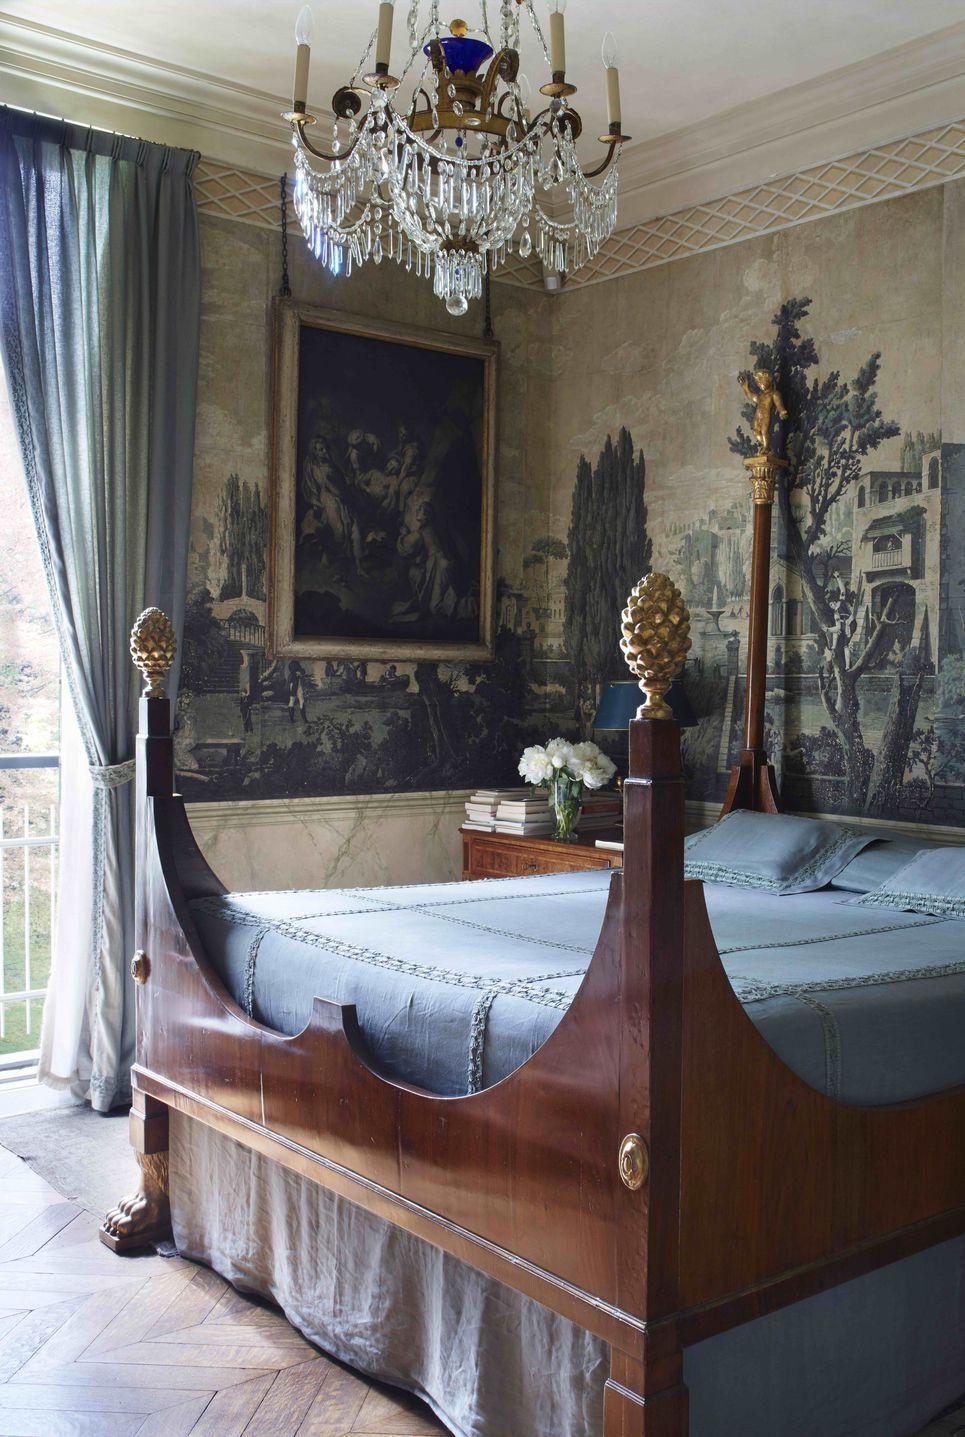 Best Home Decorating Ideas - 80+ Top Designer Decor Tricks & Tips | Decor,  Modern bedroom design, Classic home decor